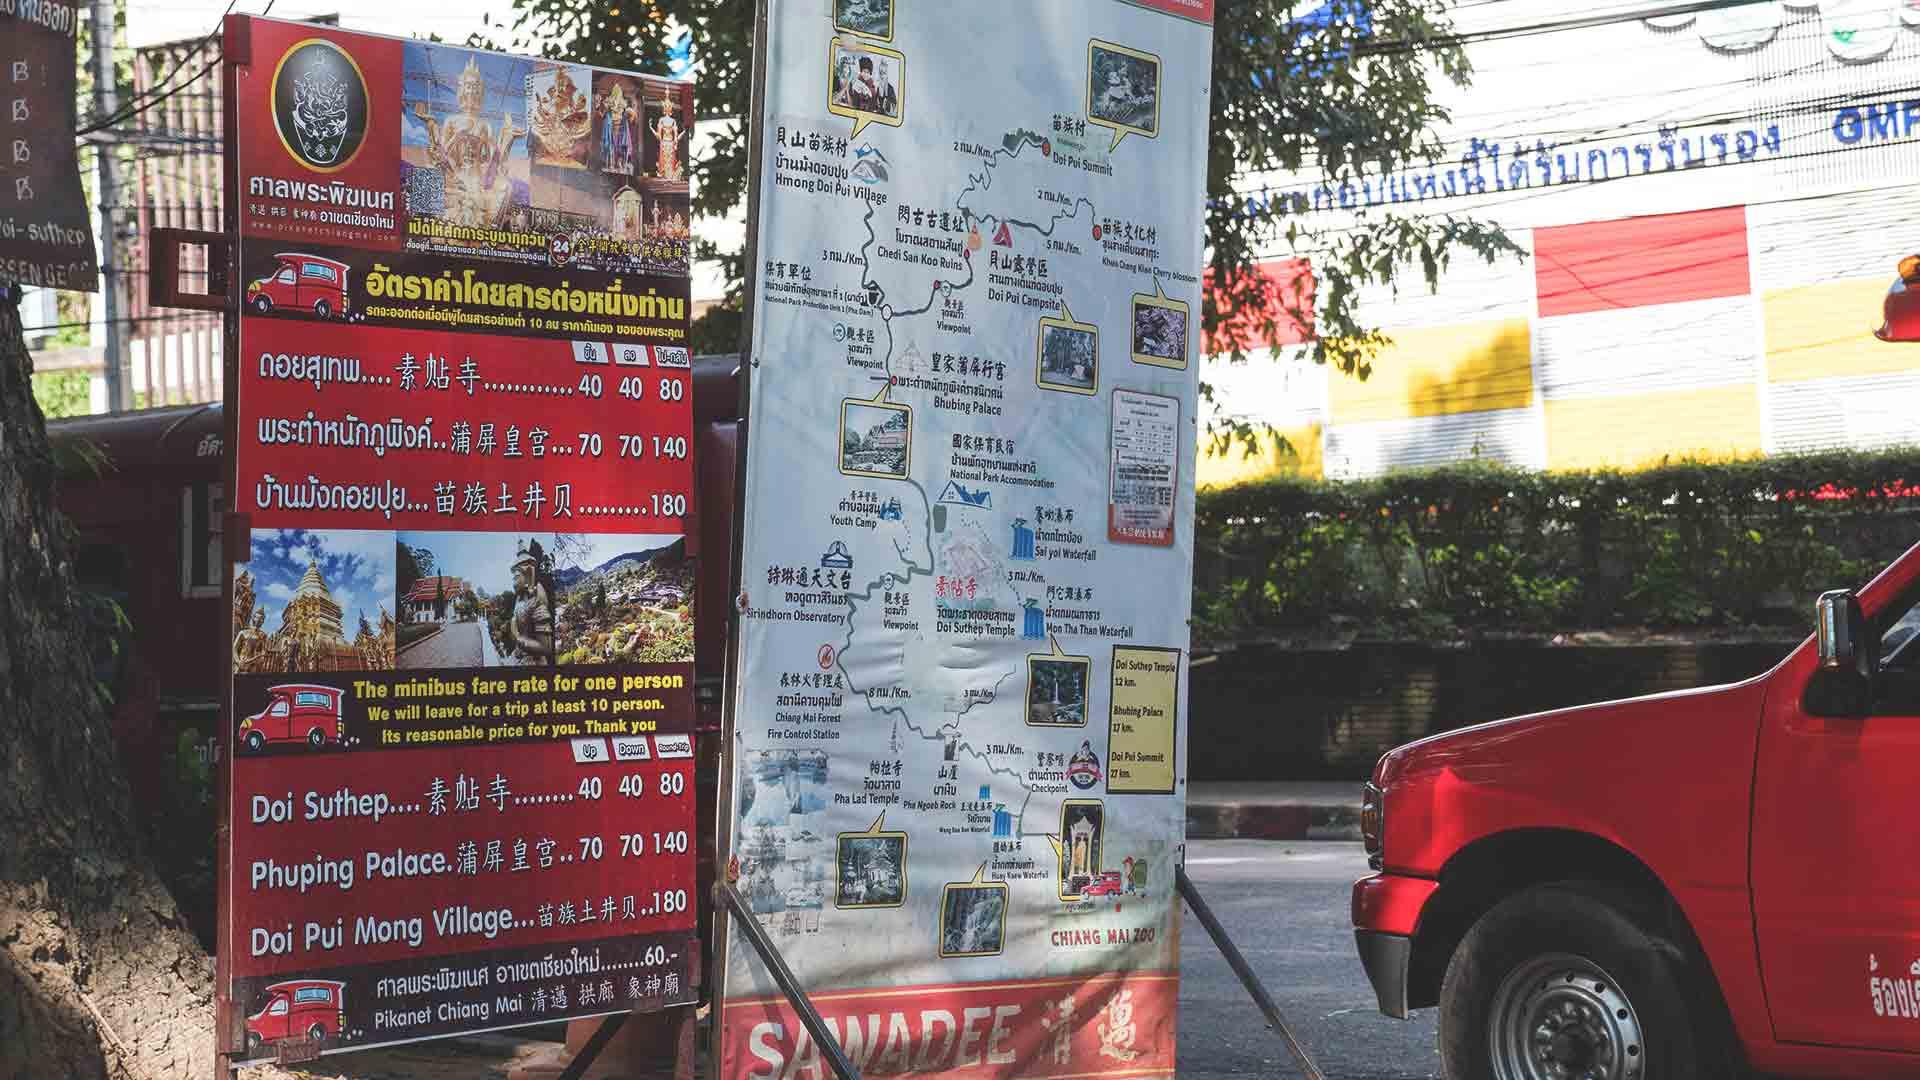 Chiang Mai Songthaew zum Doi Suthep Preise